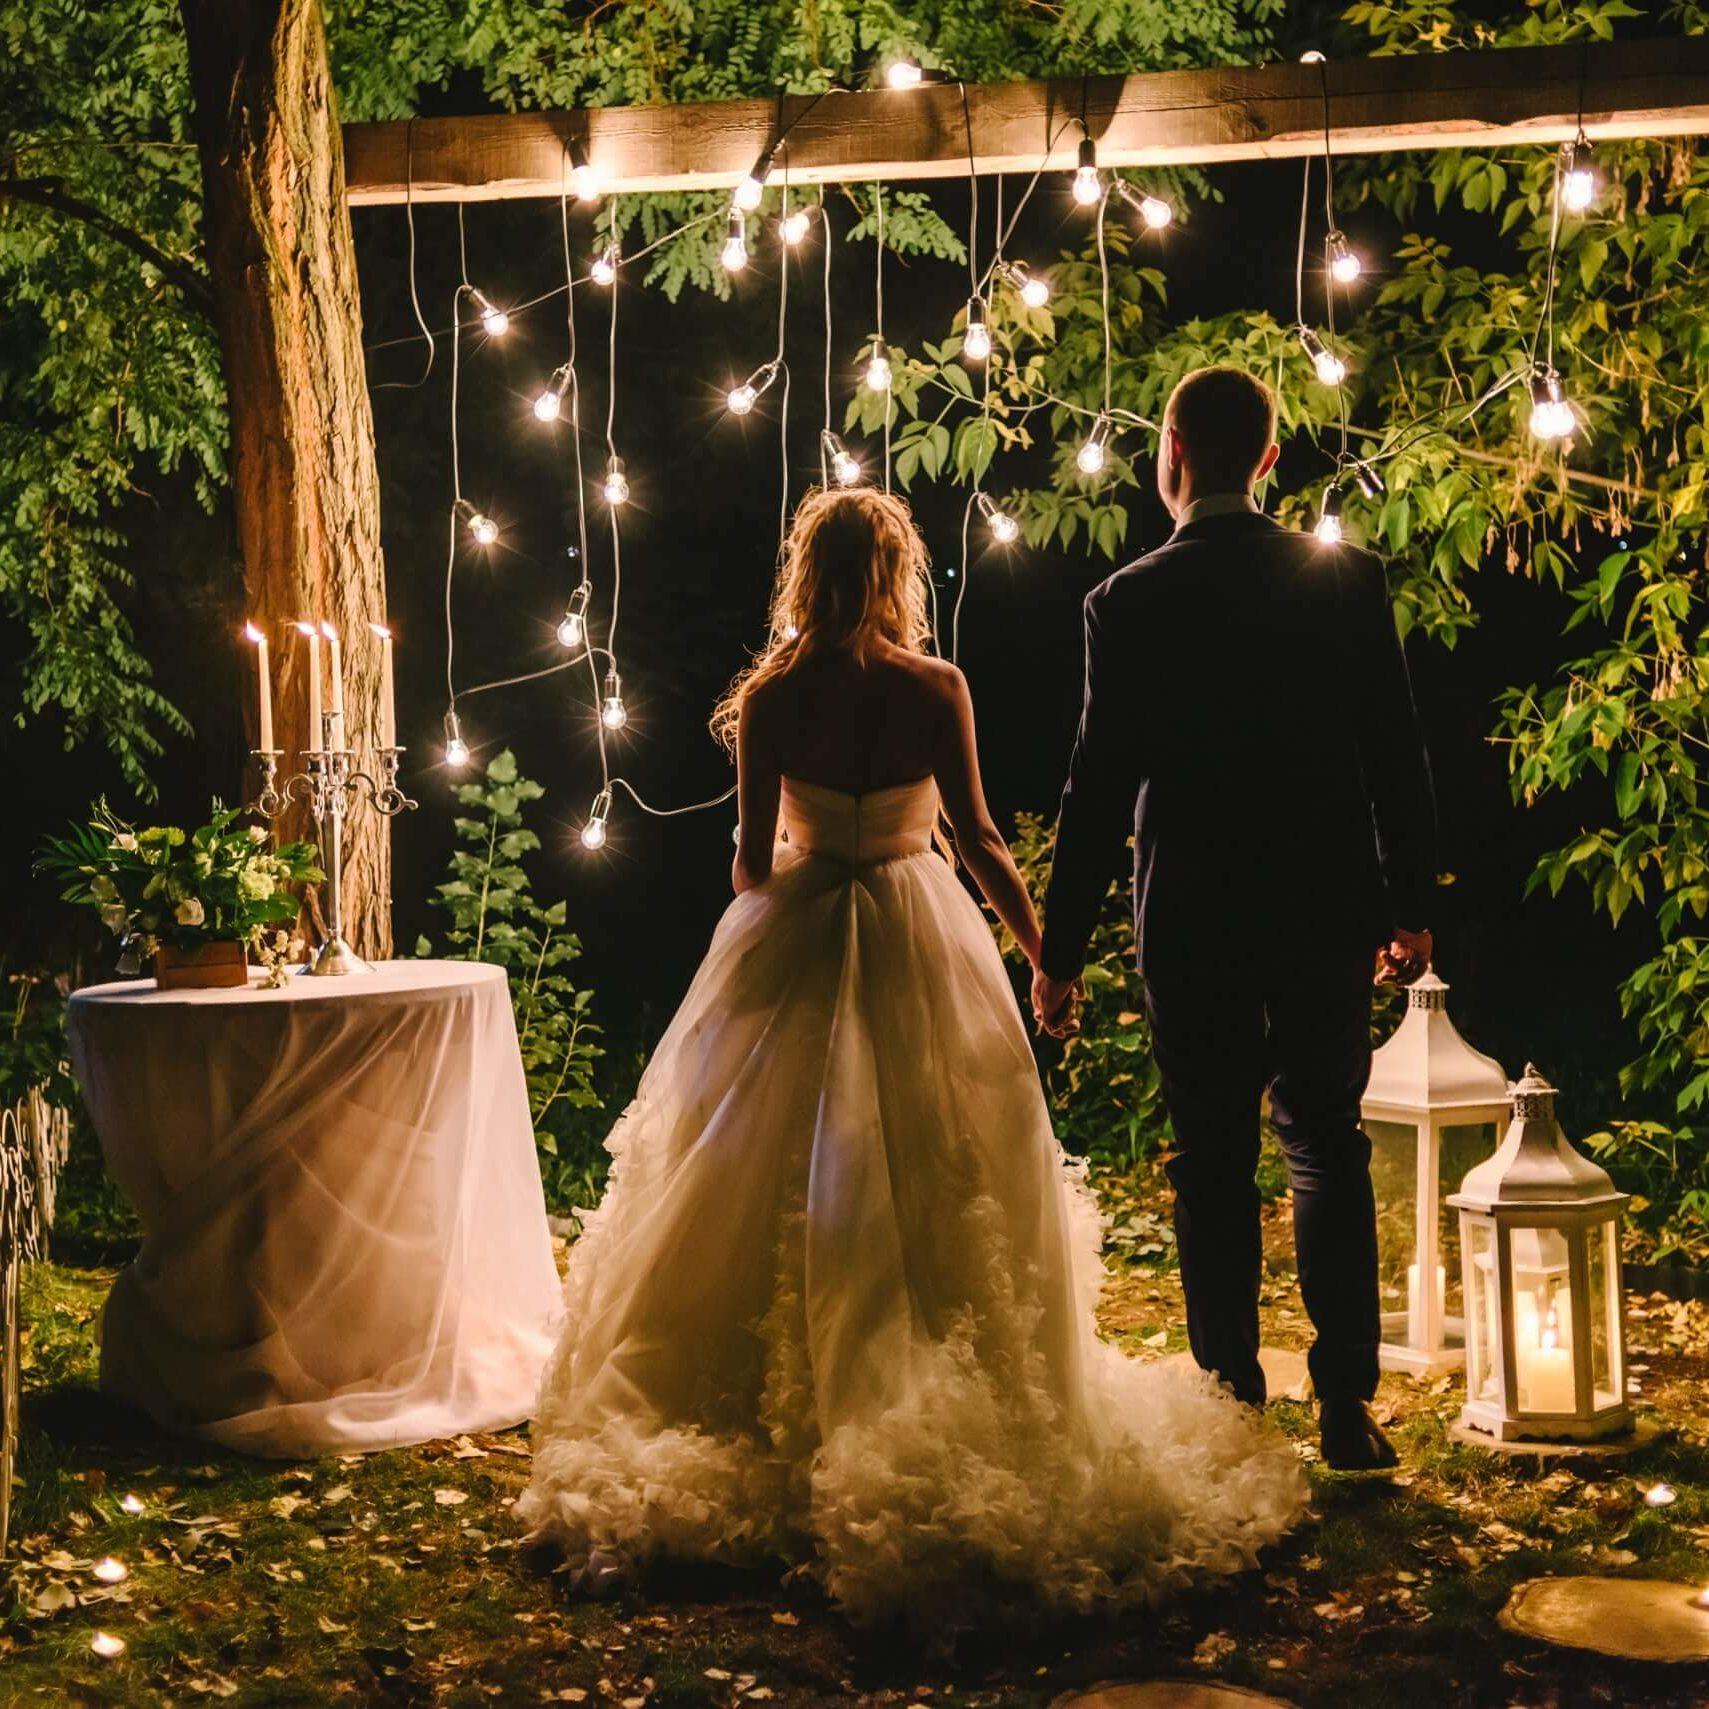 boho-evening-wedding-with-lights-min1